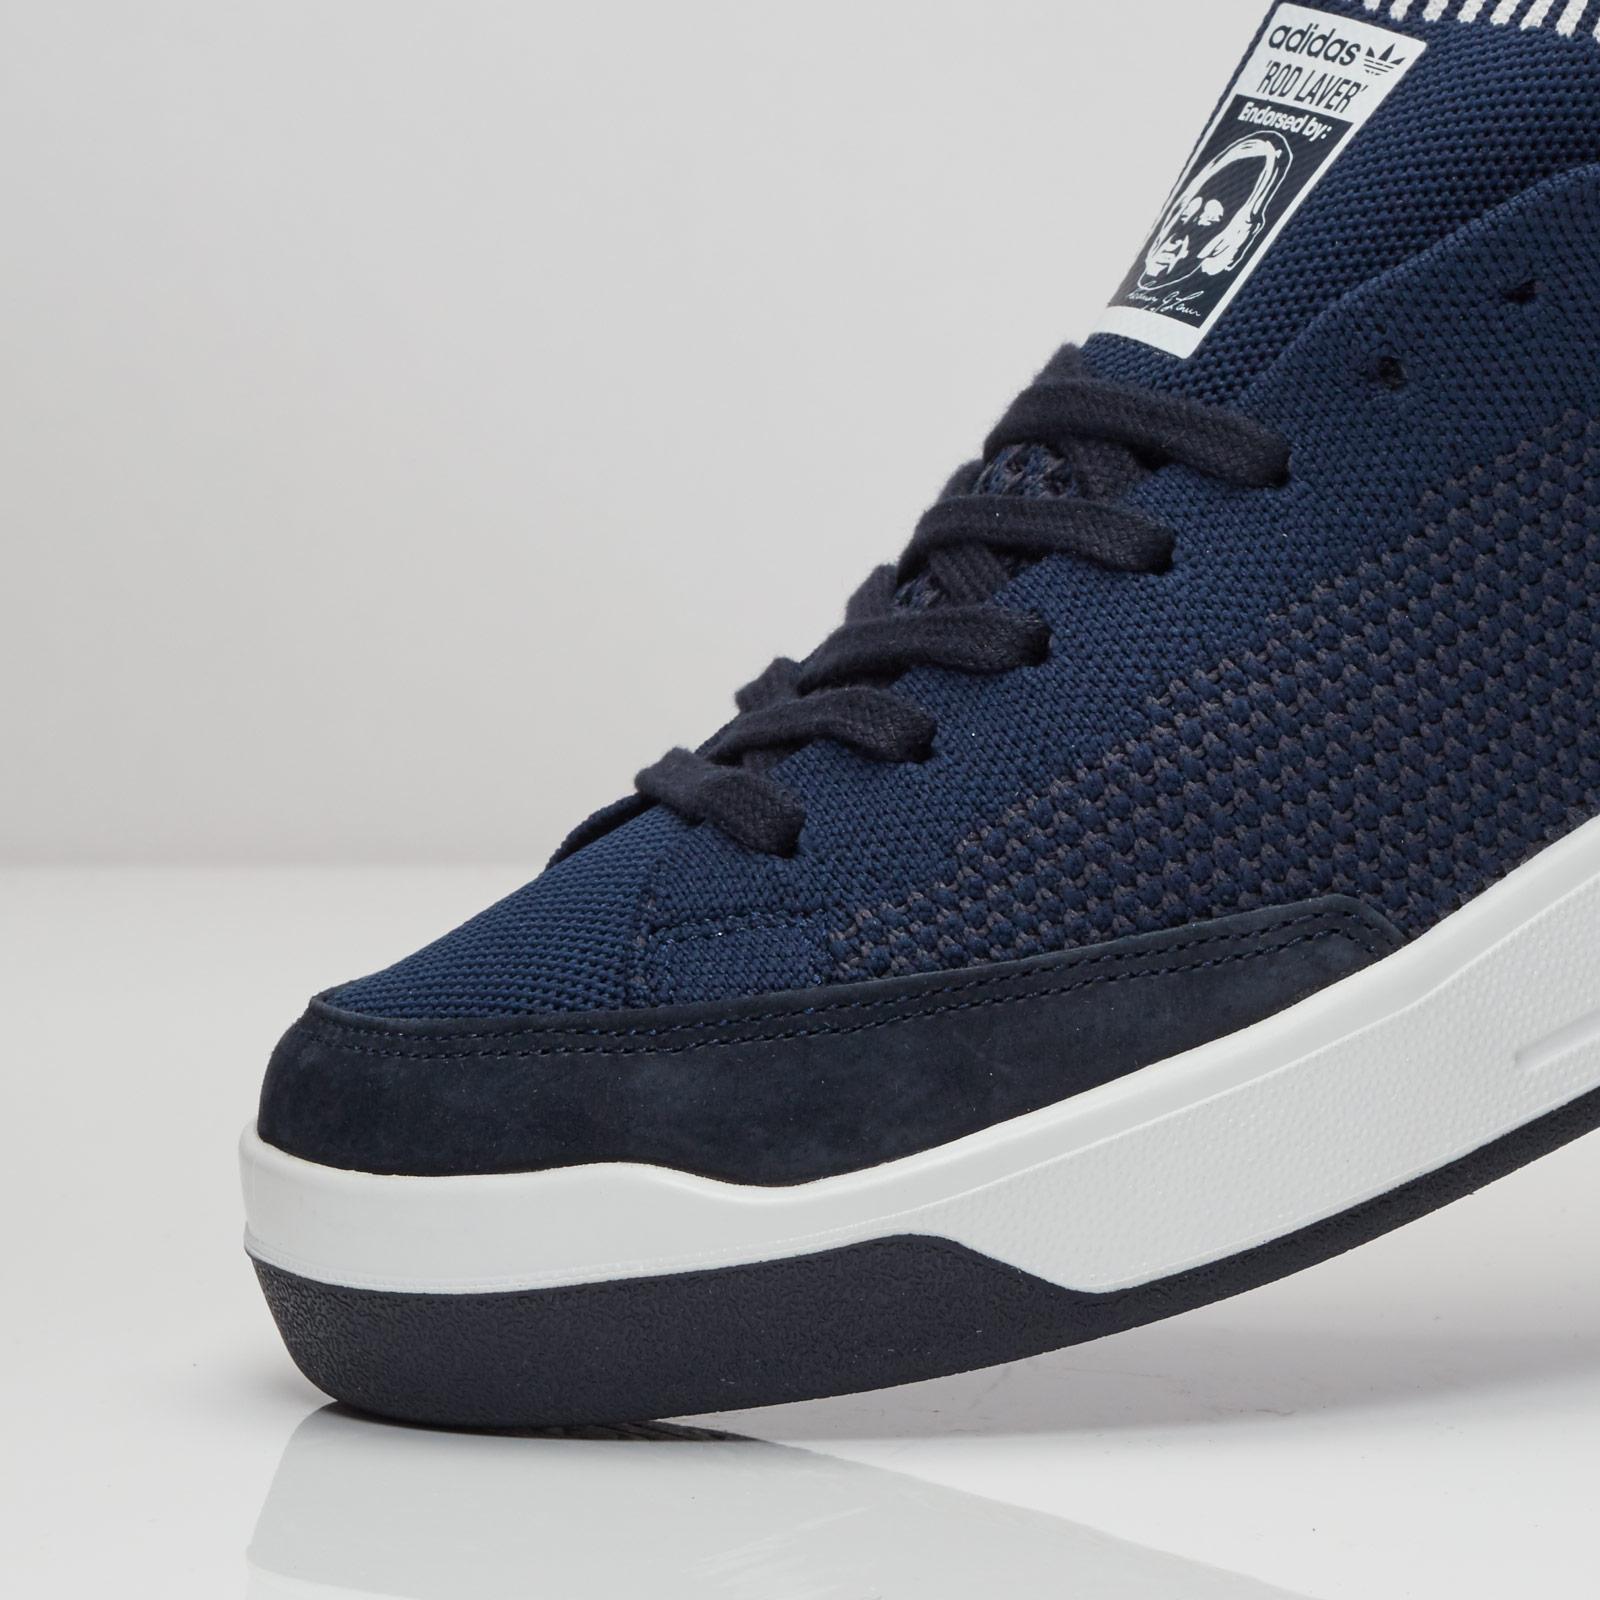 4fab15acf54def adidas Rod Laver Super Primeknit - S80513 - Sneakersnstuff ...